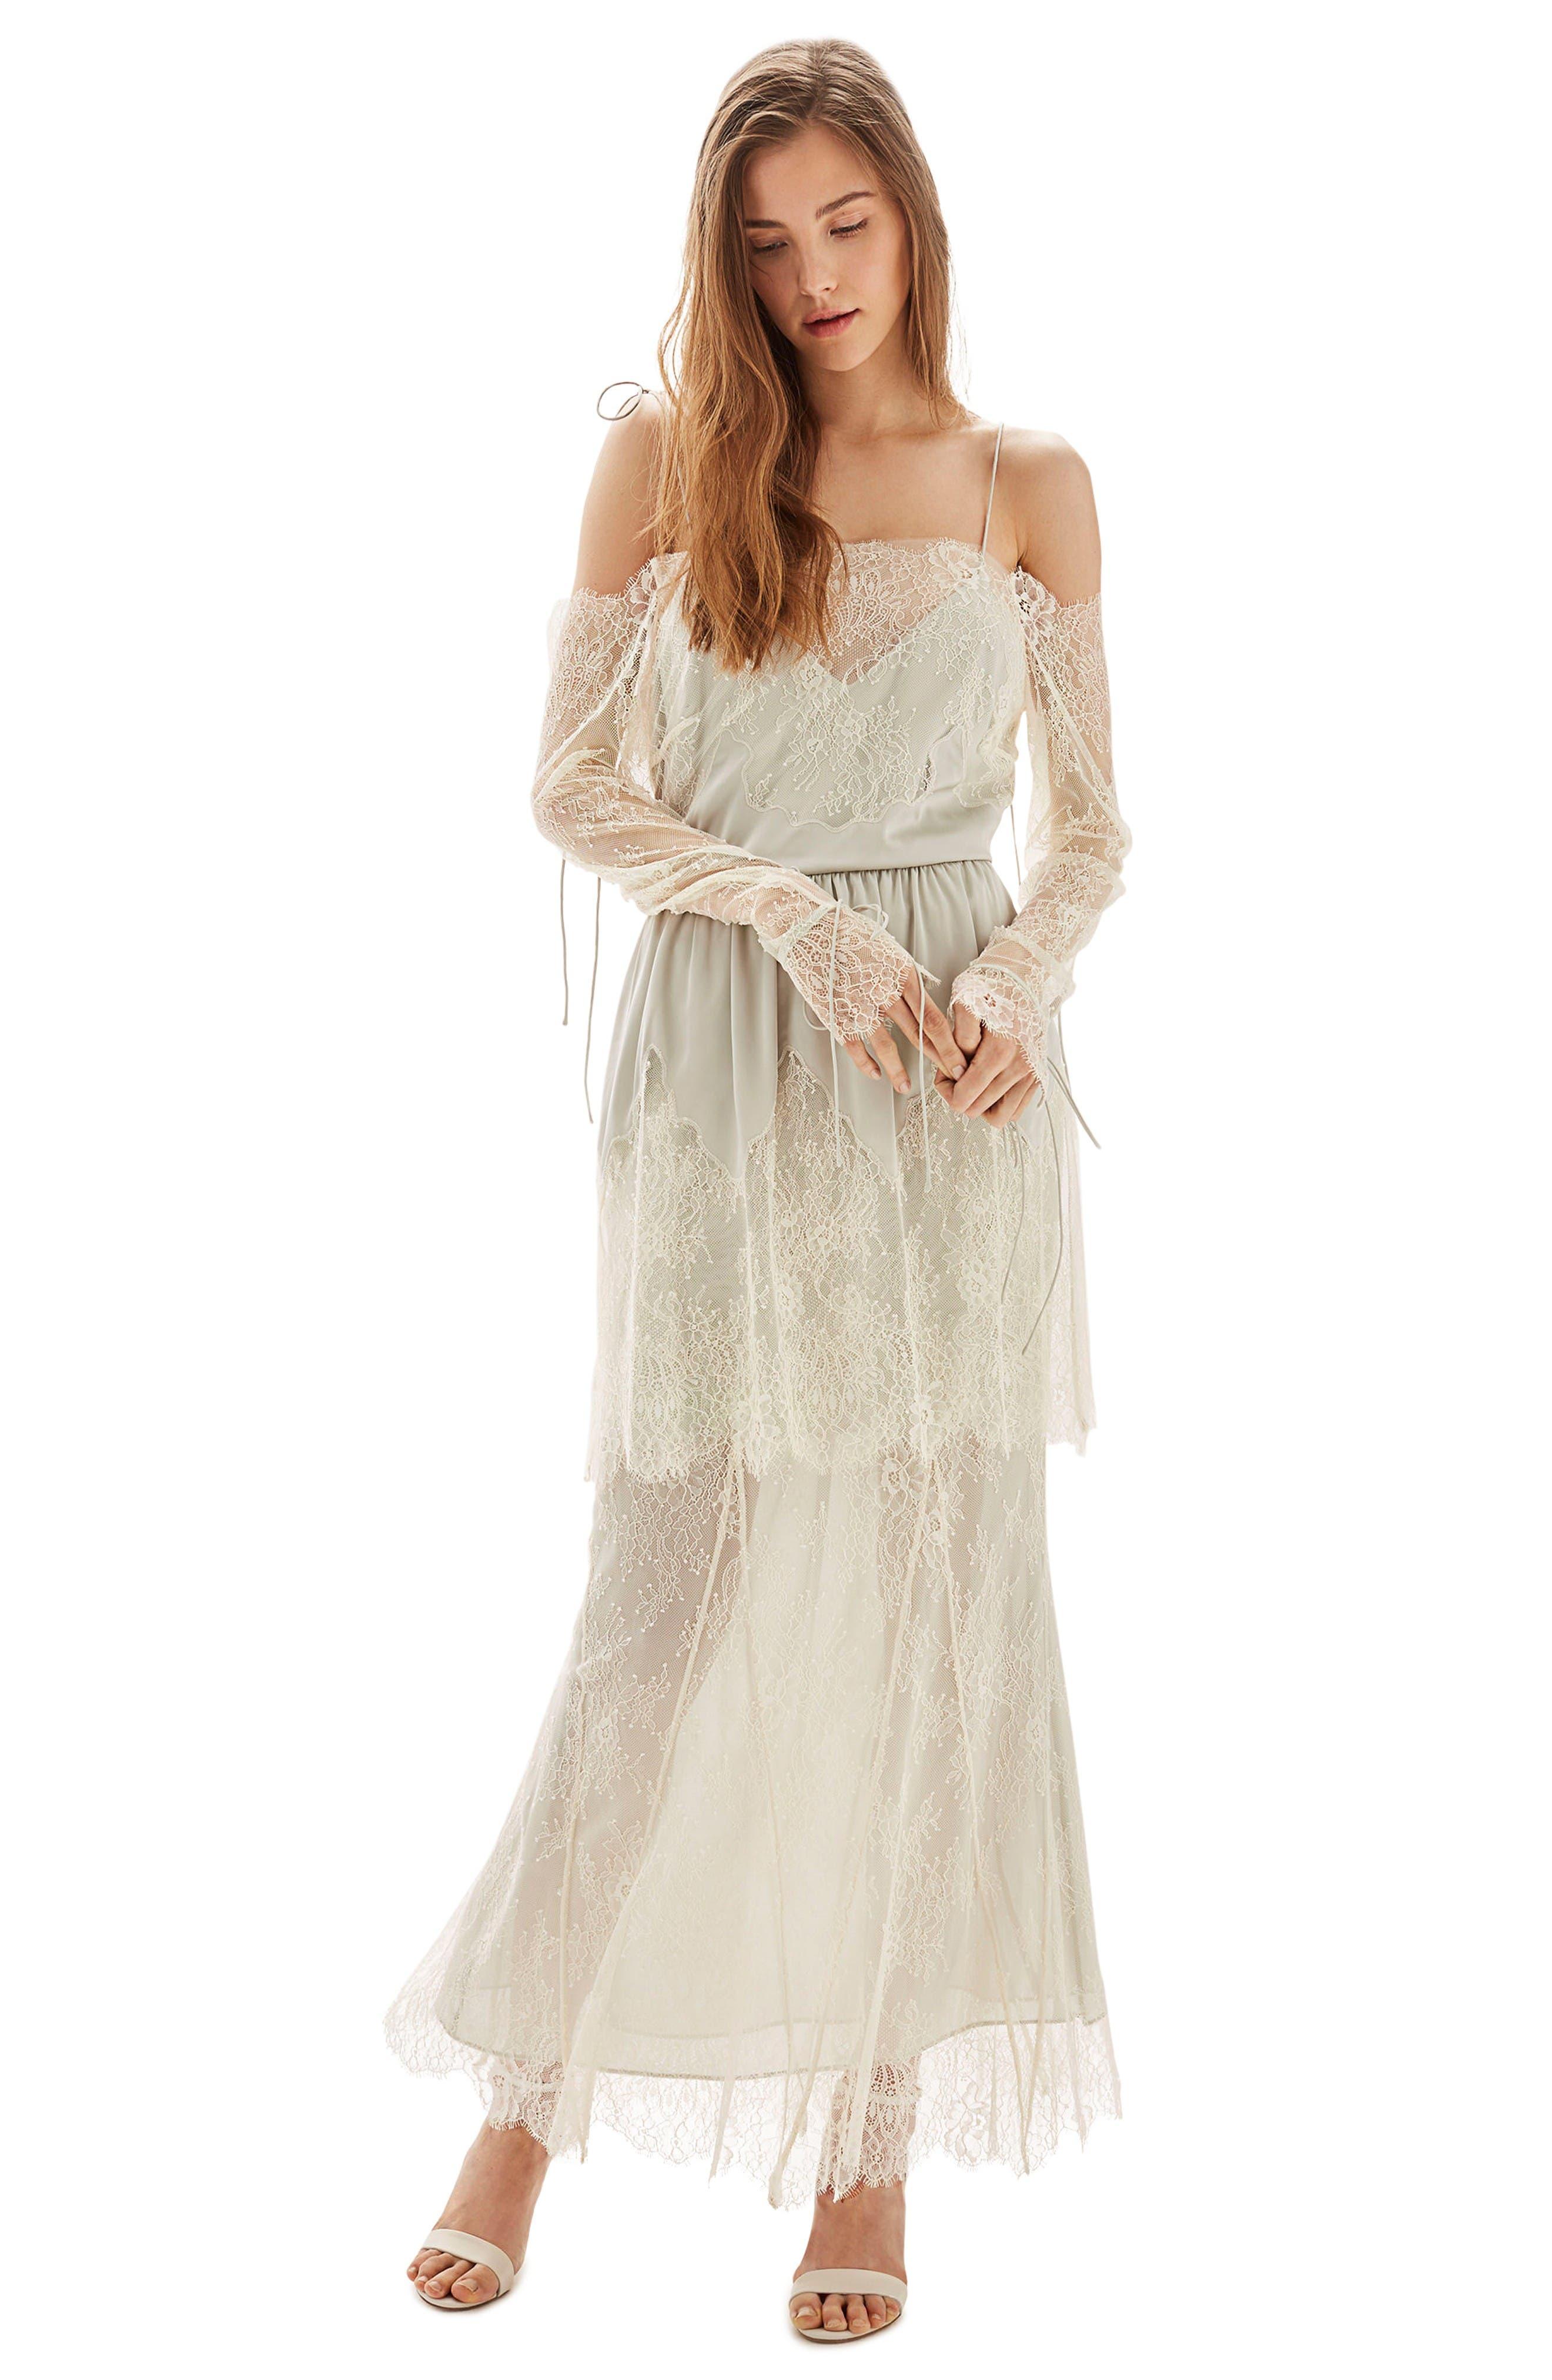 Alternate Image 1 Selected - Topshop Bride Bardot Lace Off the Shoulder Gown